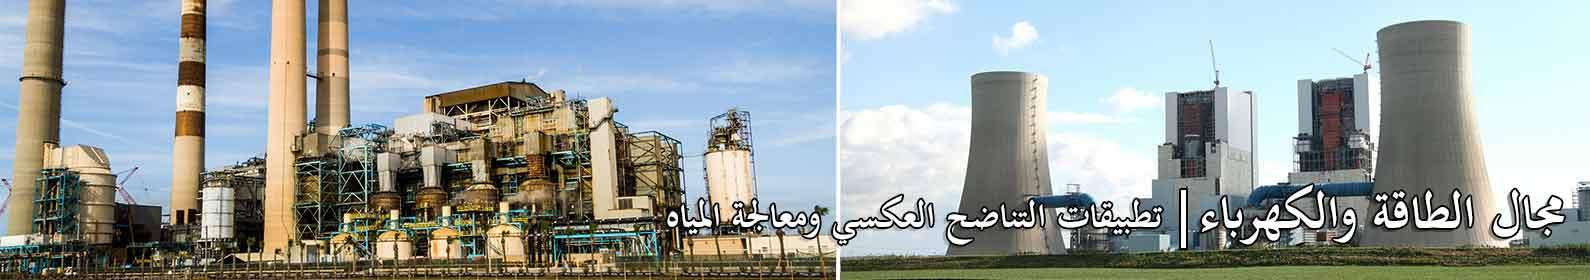 -power-energy-industry.jpg